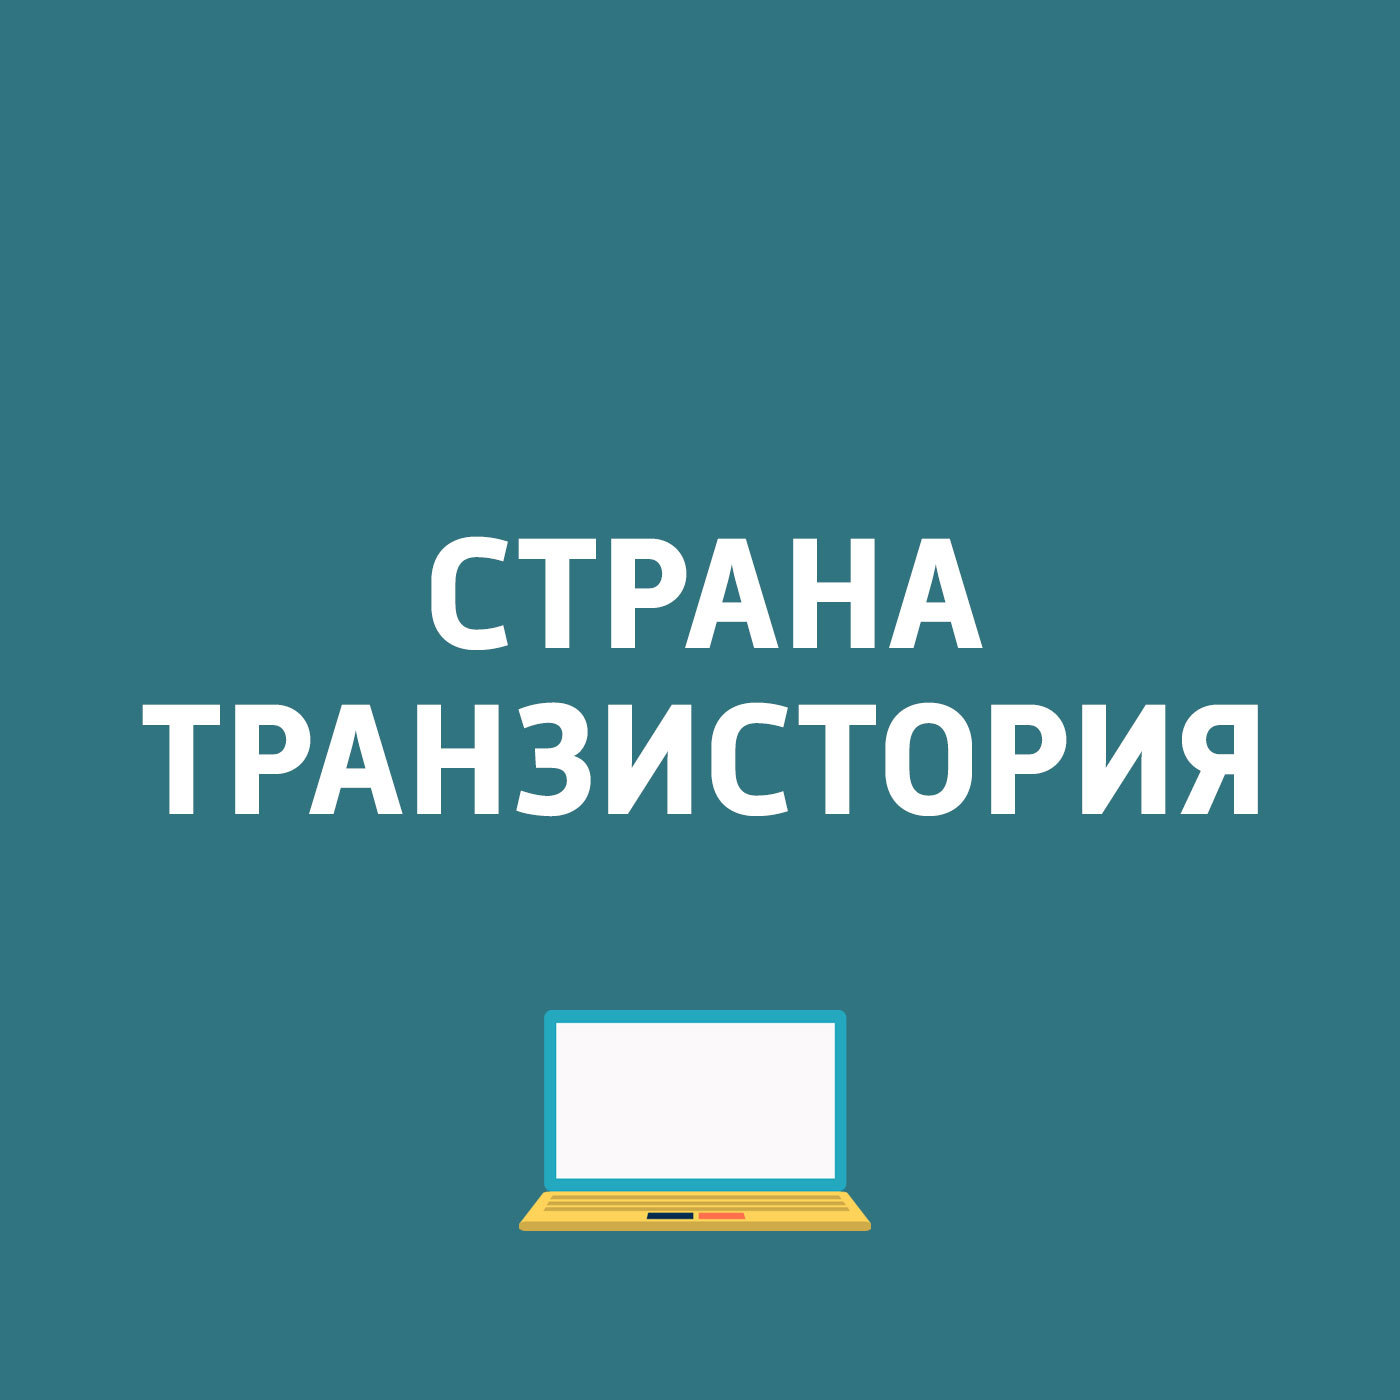 Картаев Павел Smart Band HW01; «Отпечатки войны... картаев павел бискотти